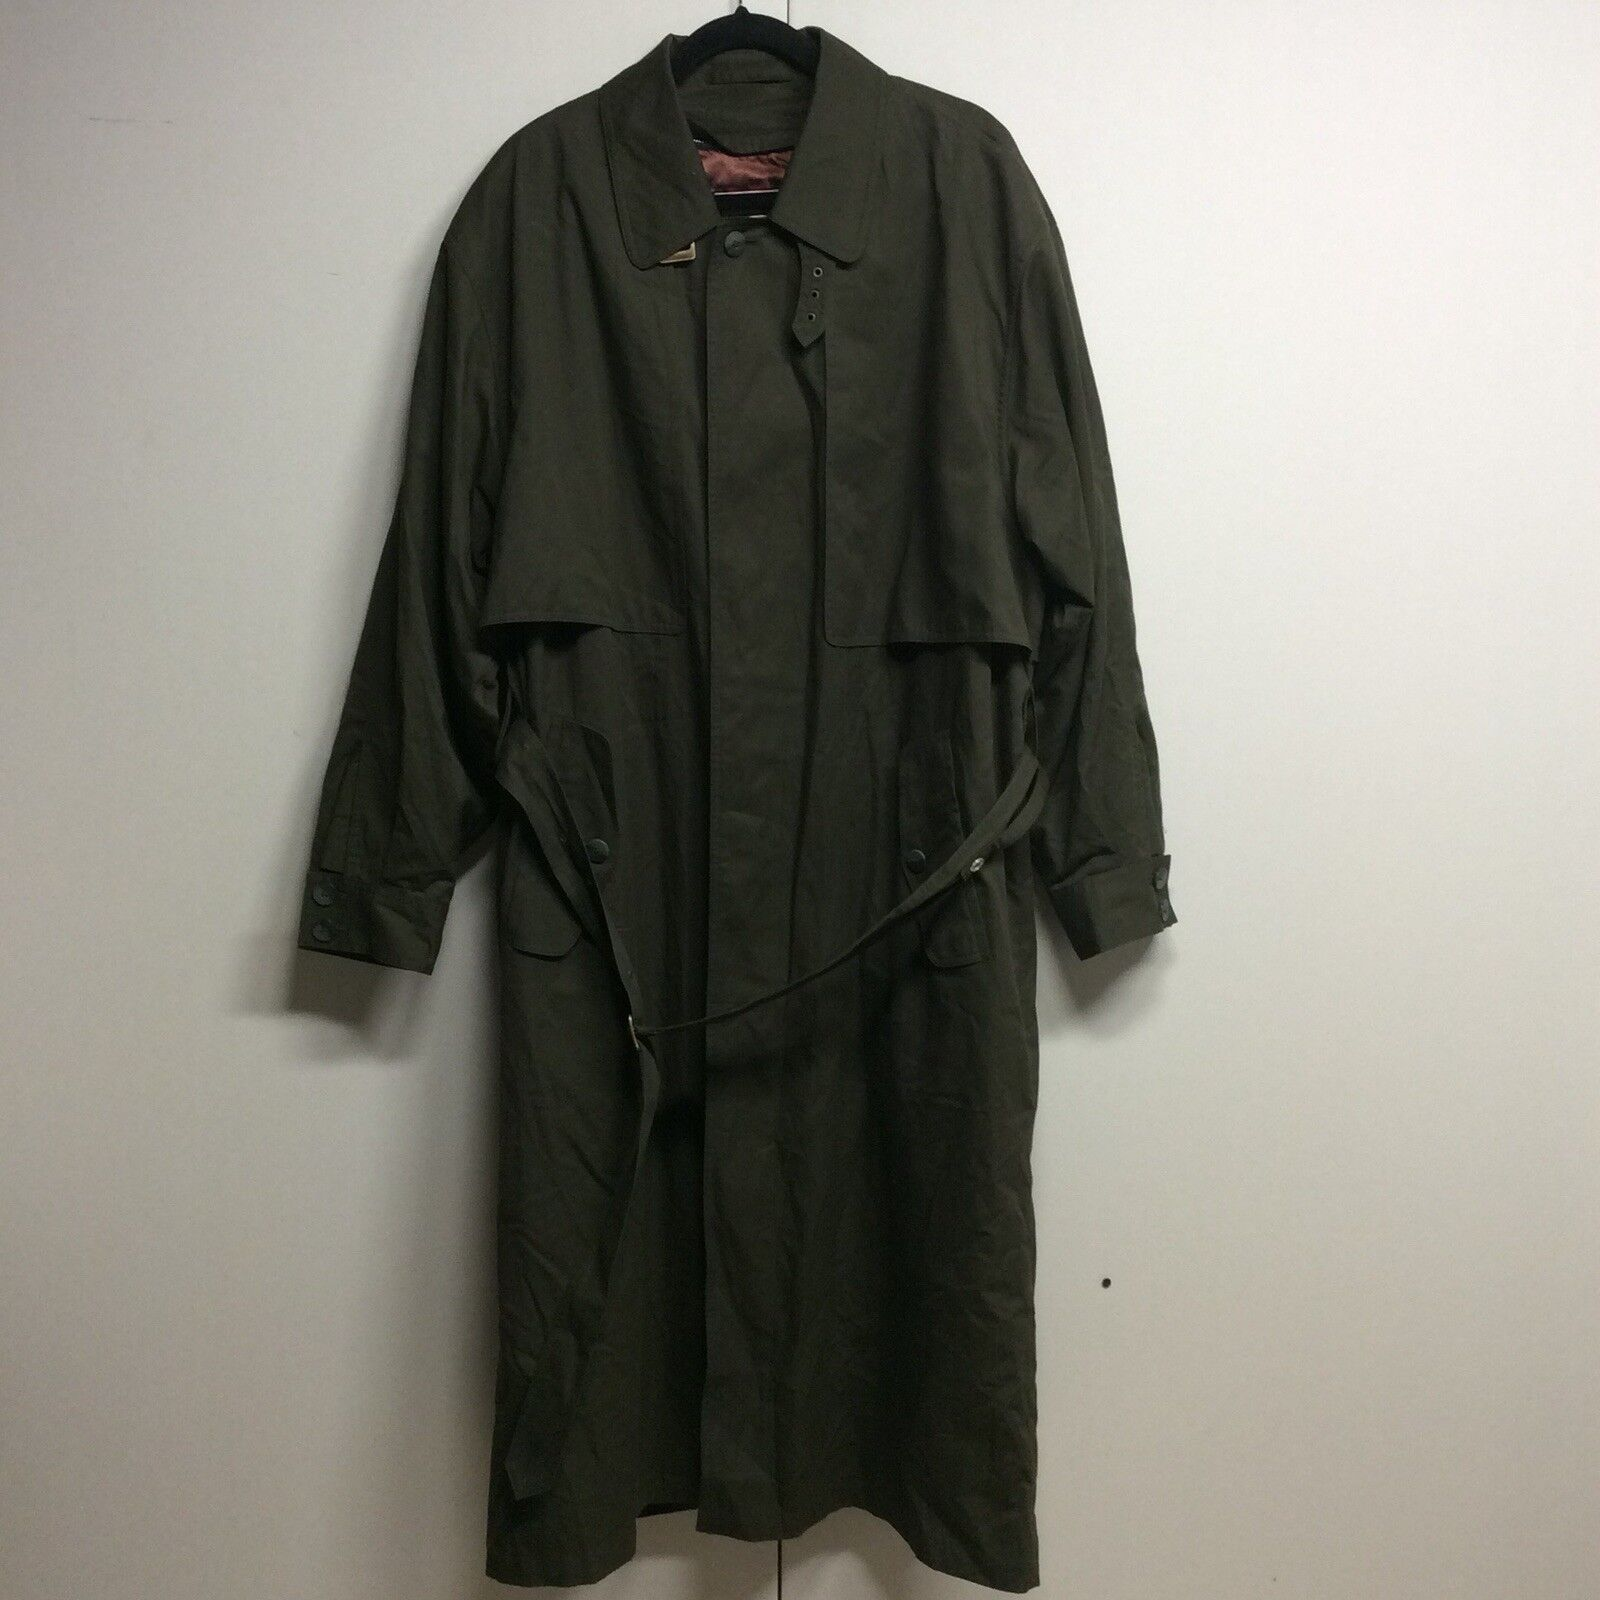 London Fog Towne Men's Trench Coat Green Long Button Down Size 42